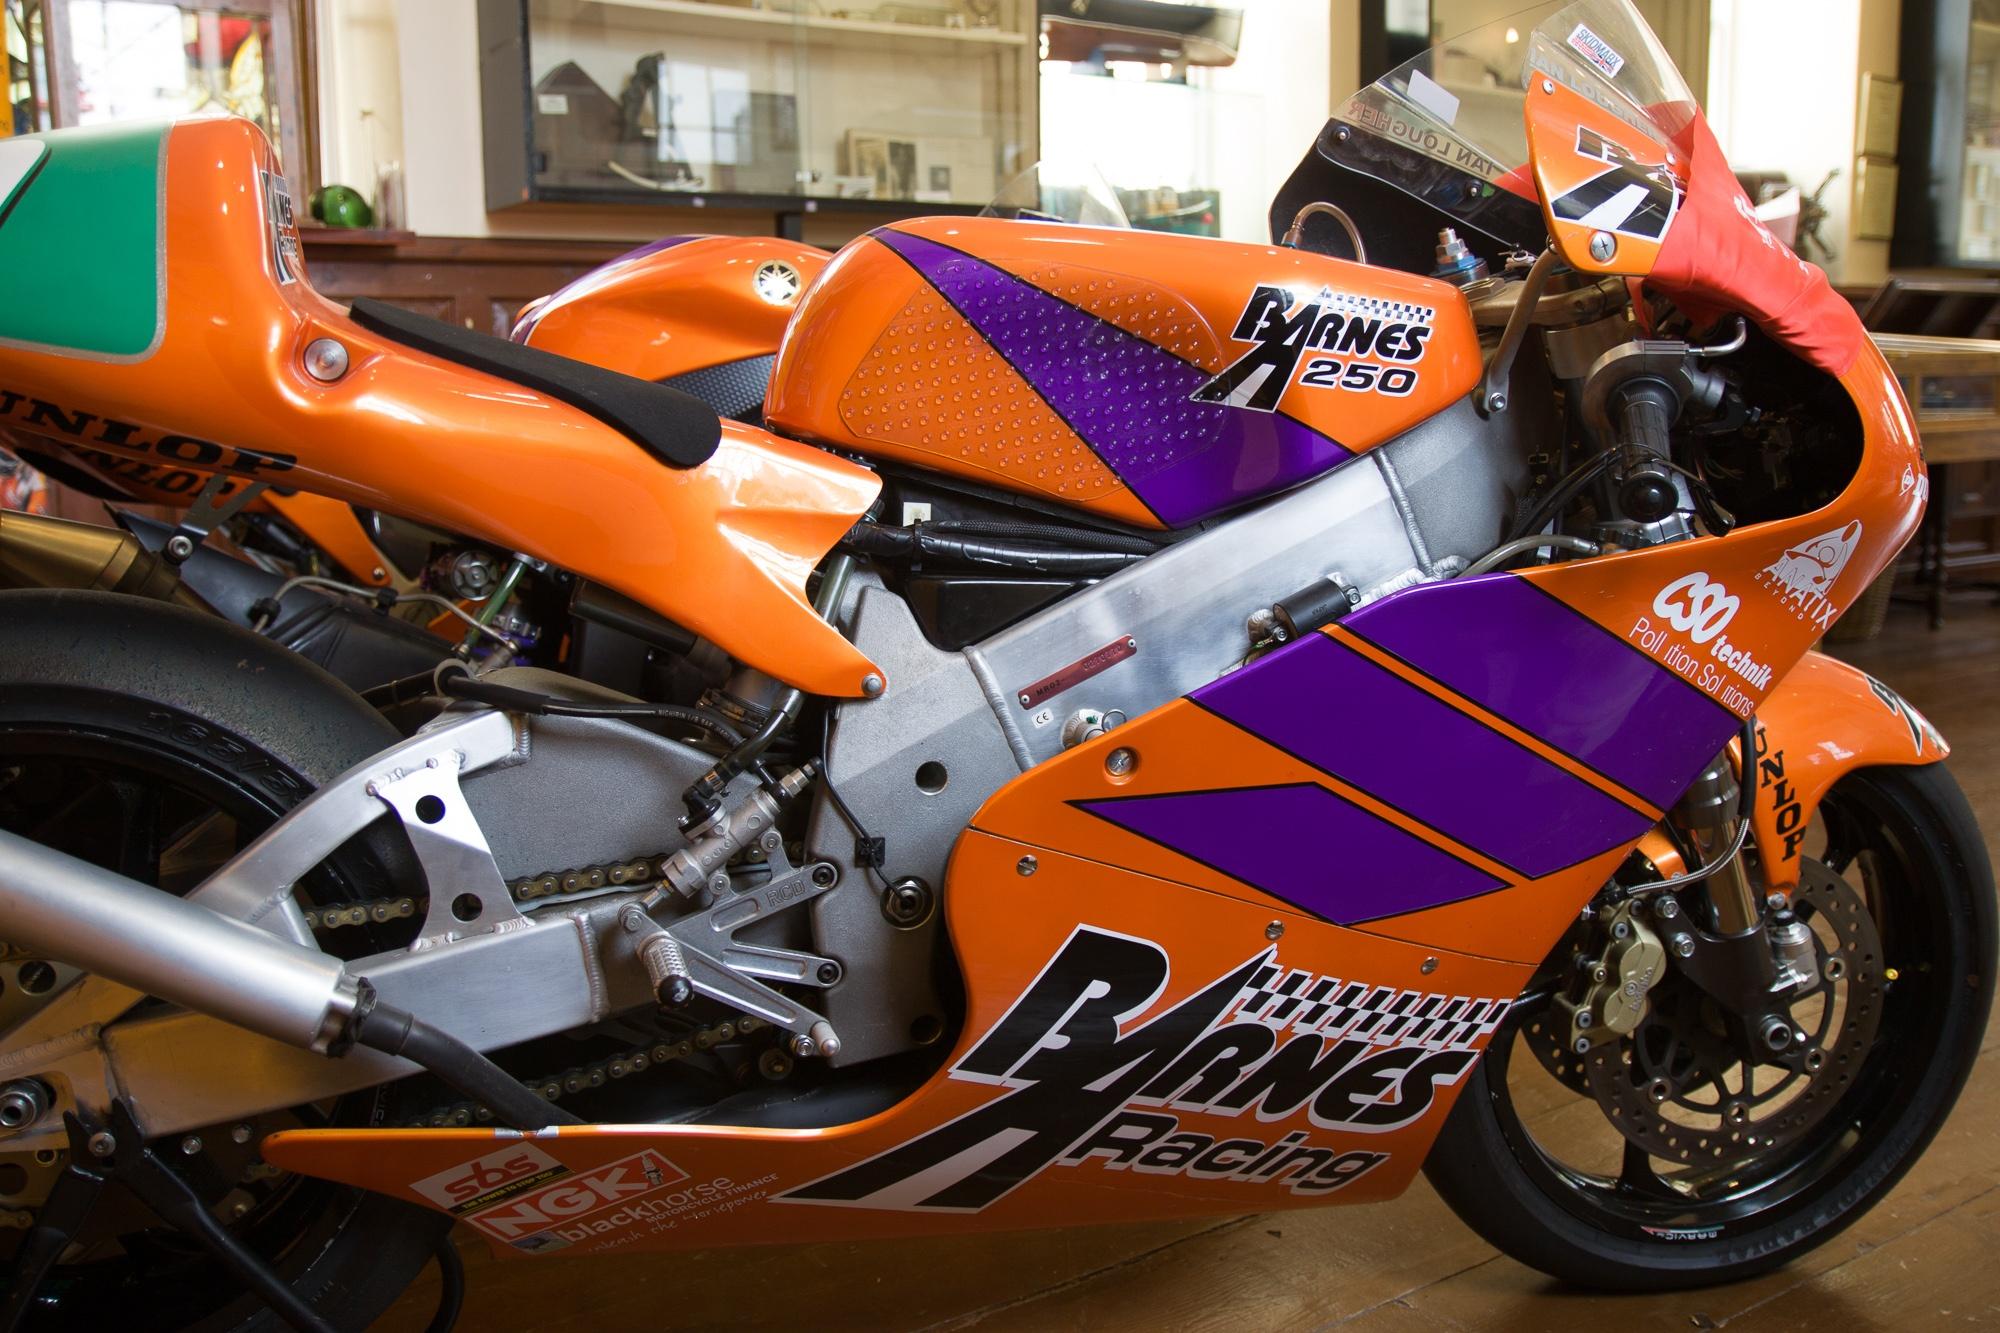 Honda RS250 Grand Prix machine